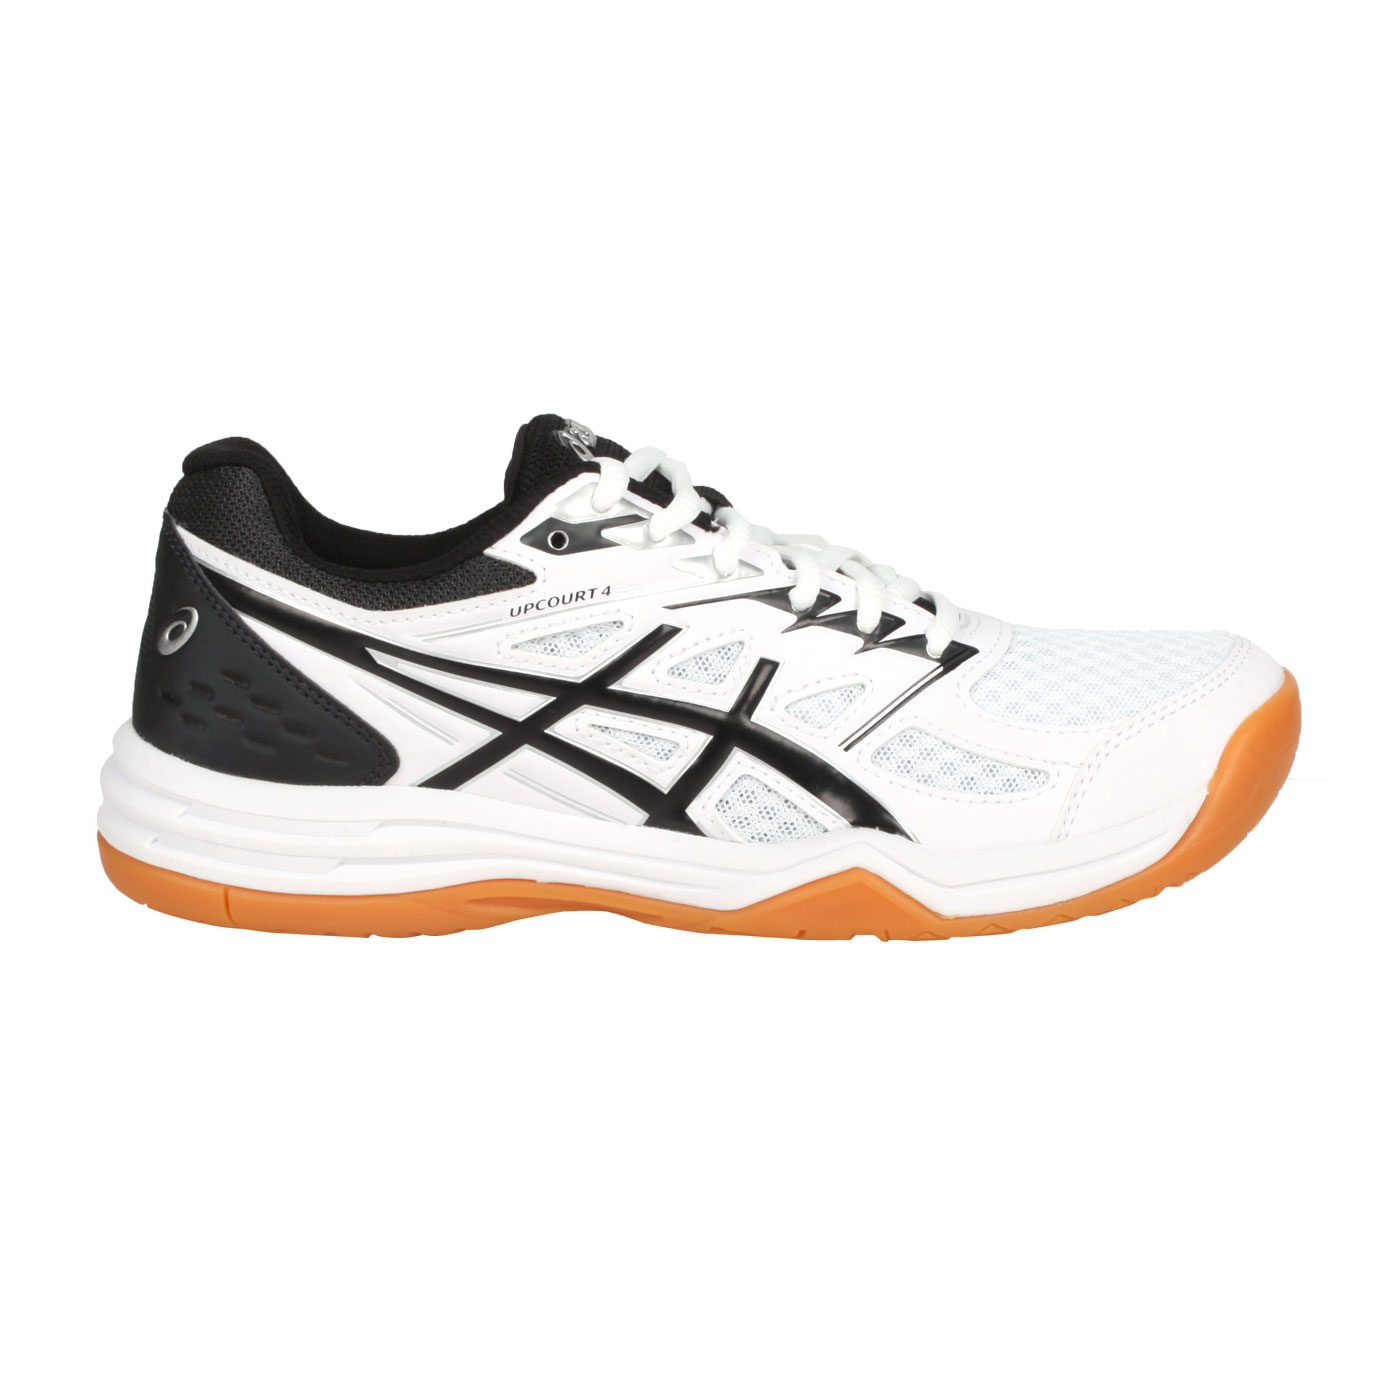 ASICS 女款排羽球鞋  @UPCOURT 4@1072A055-100 - 白黑